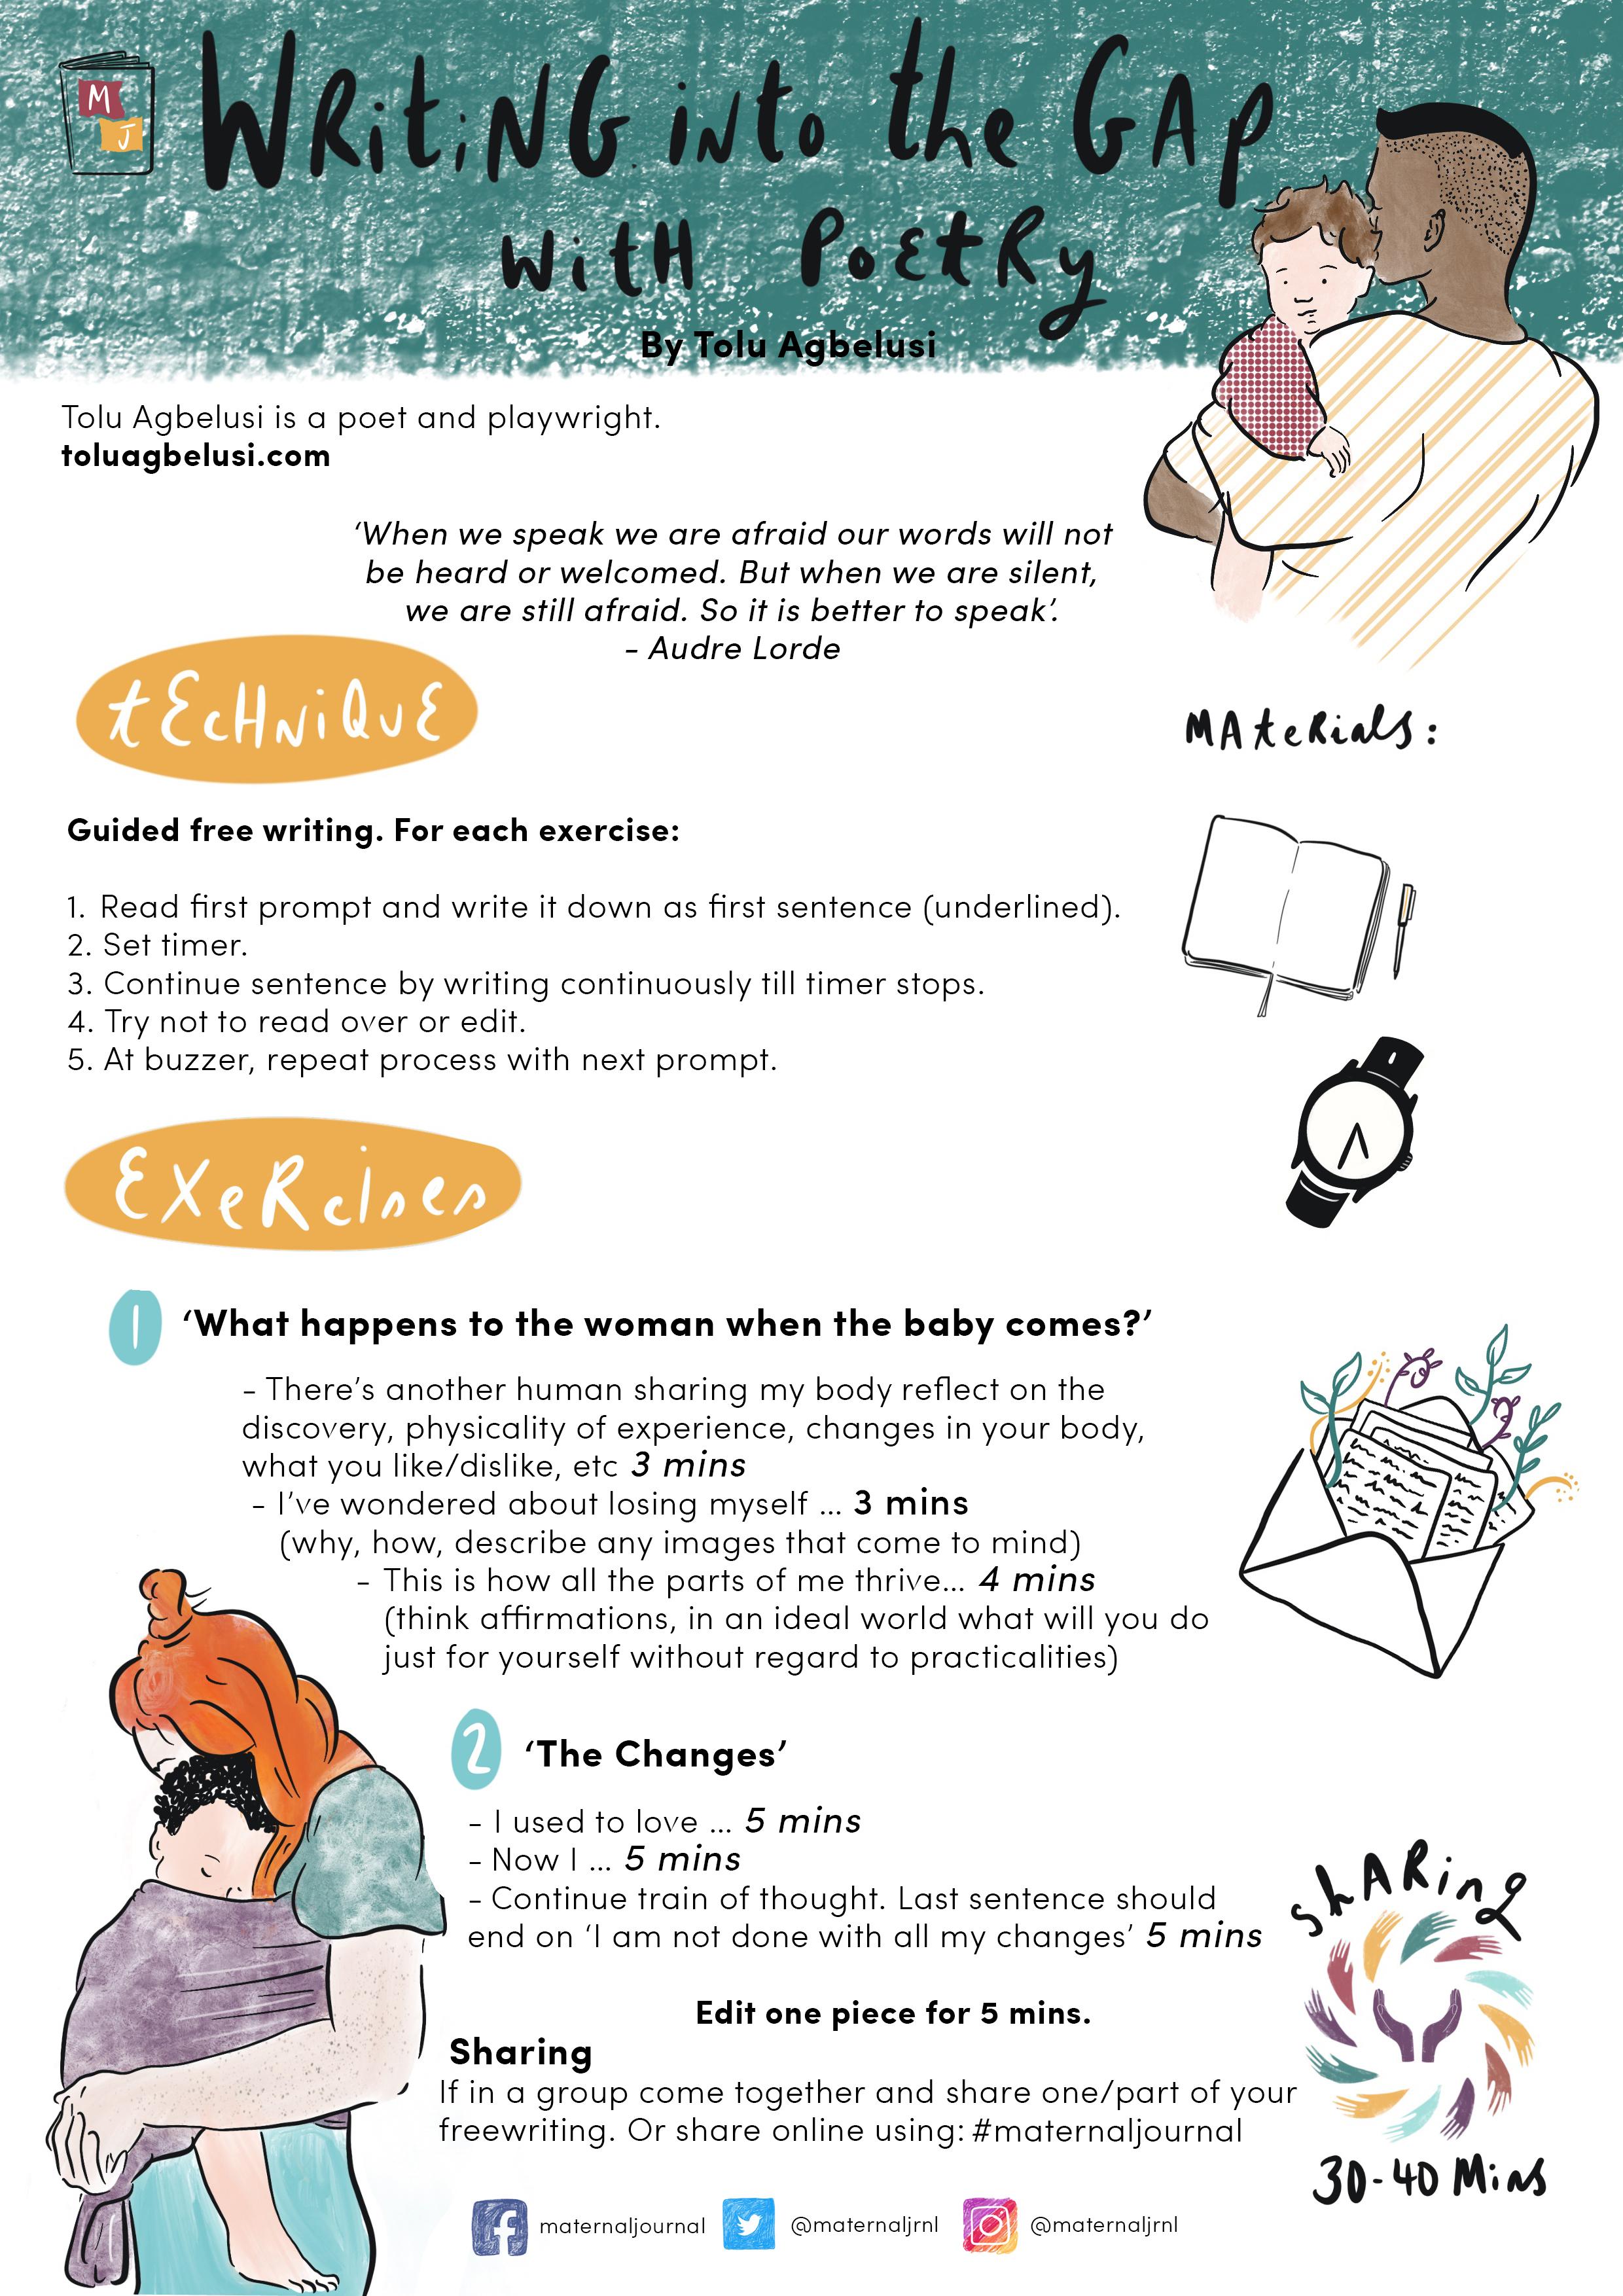 F_Writing_In_The_Gap.jpg